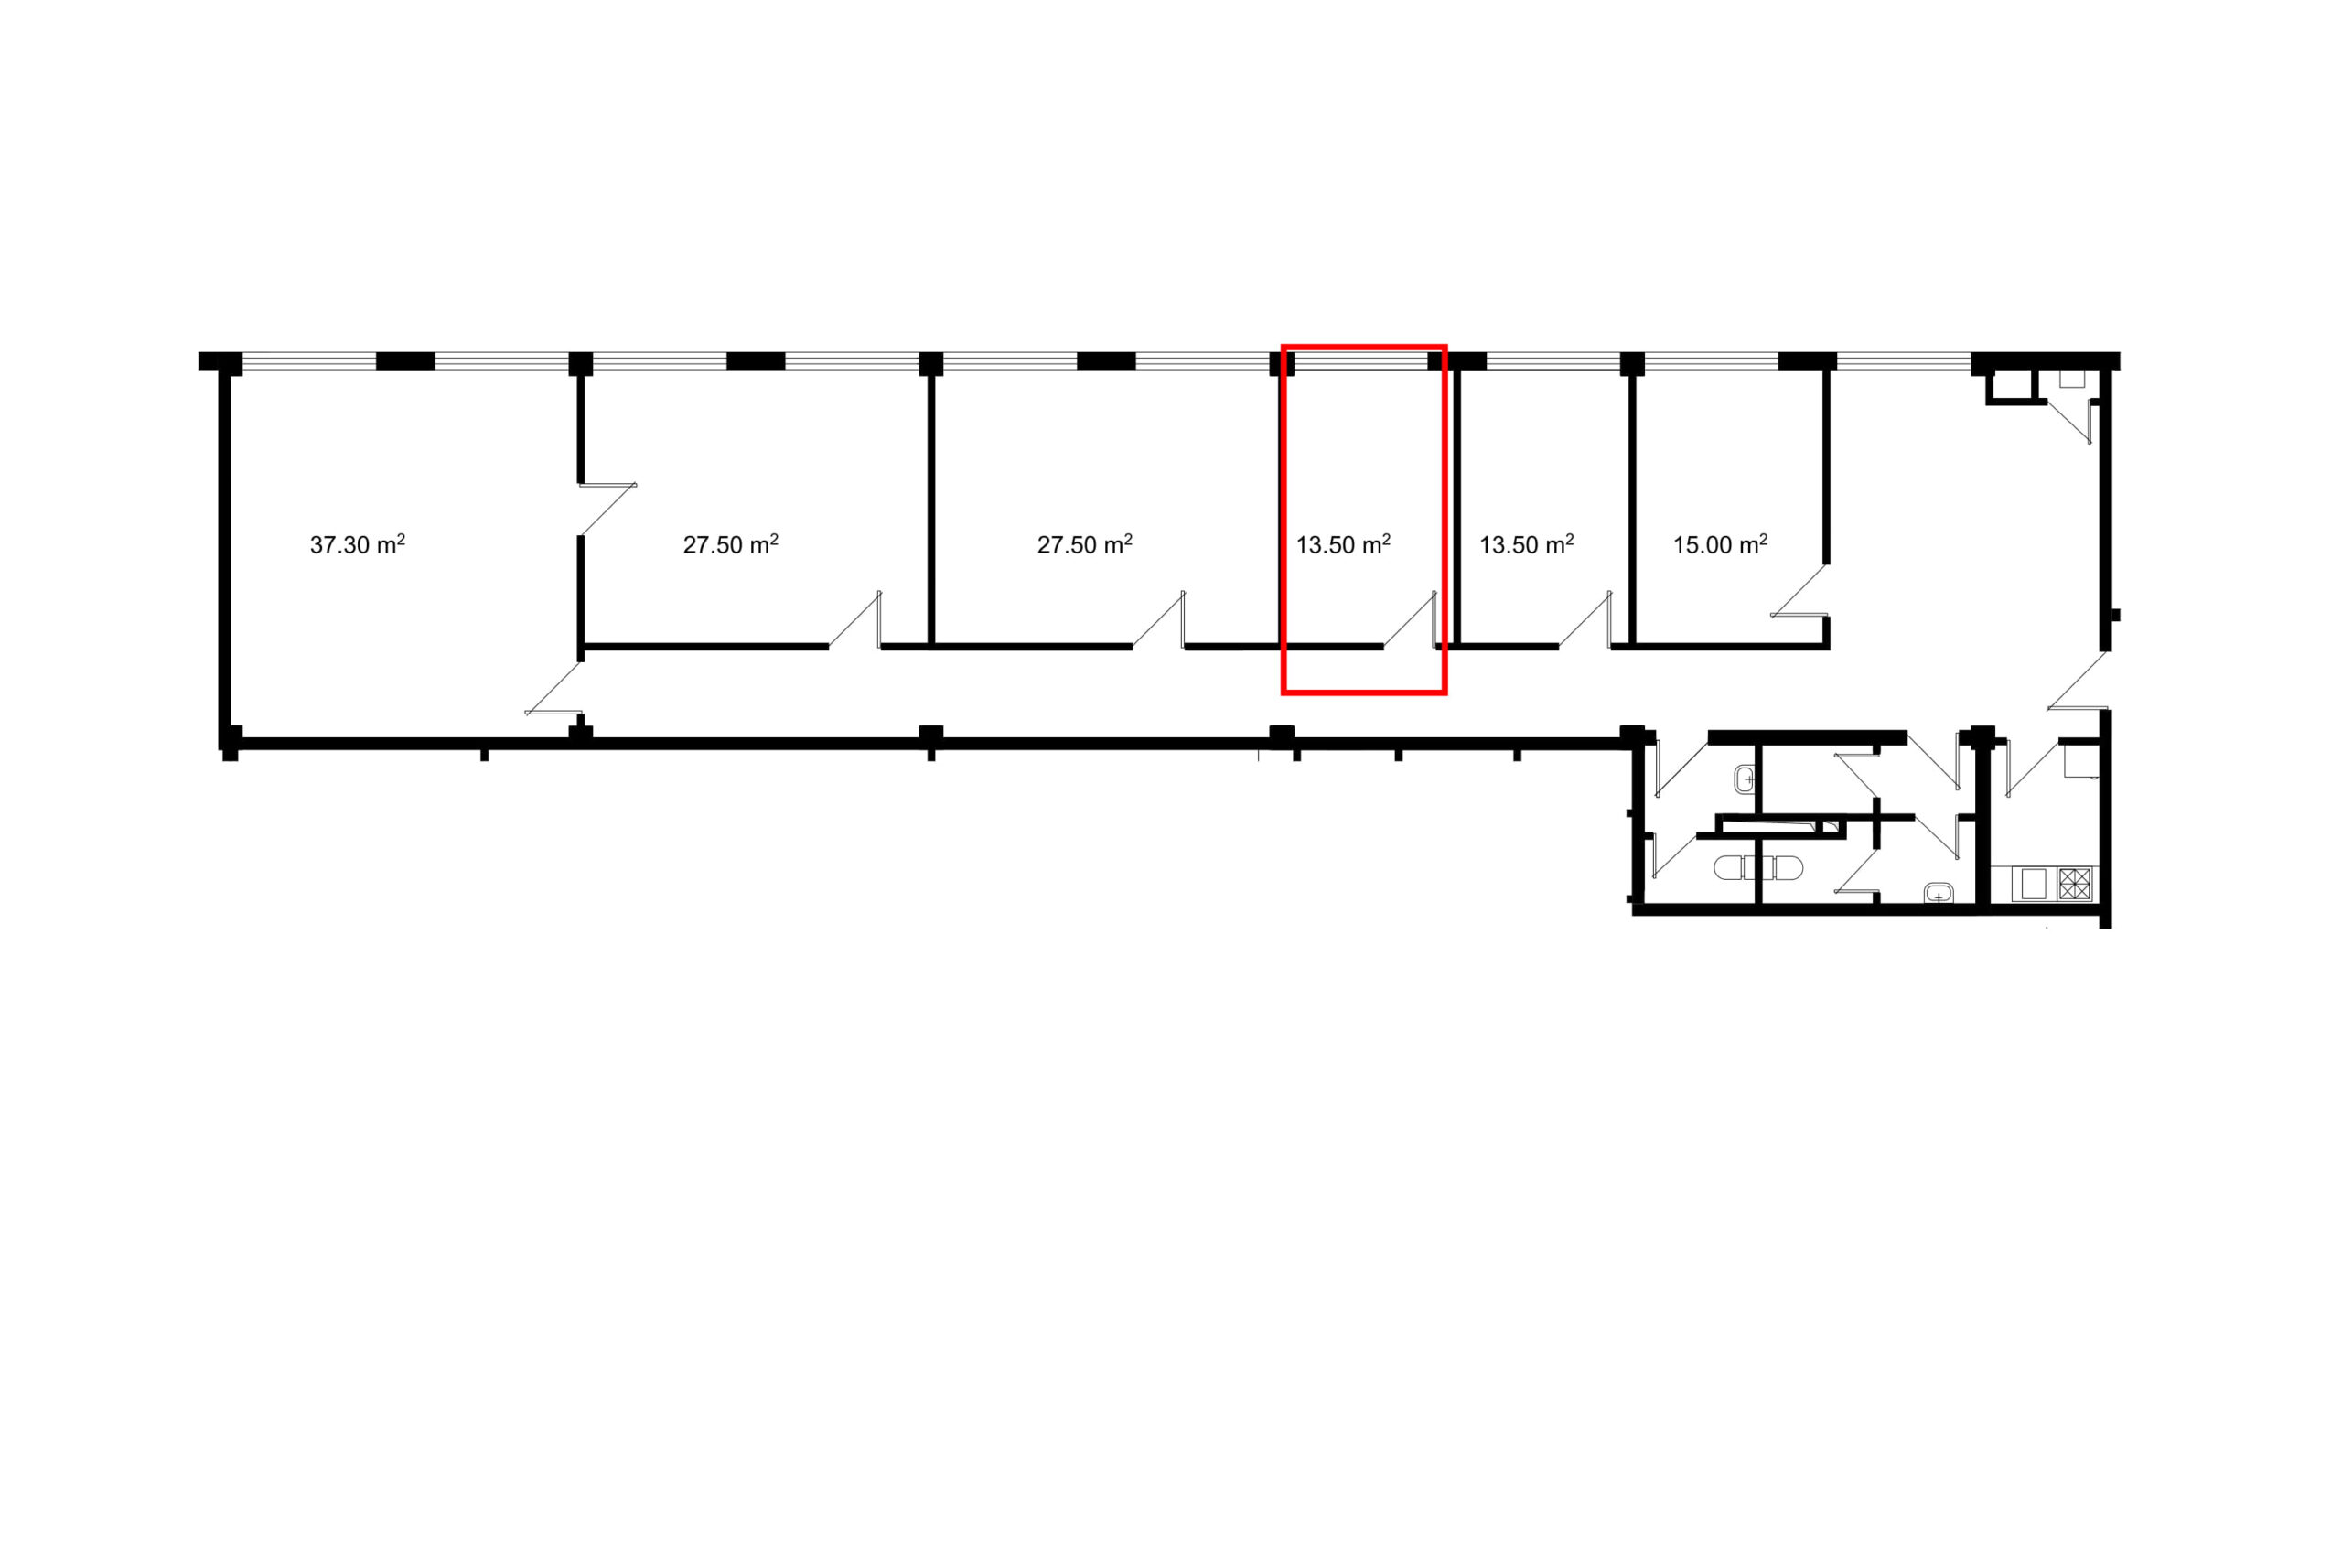 BCV-presentation 13.50 sq.m-10